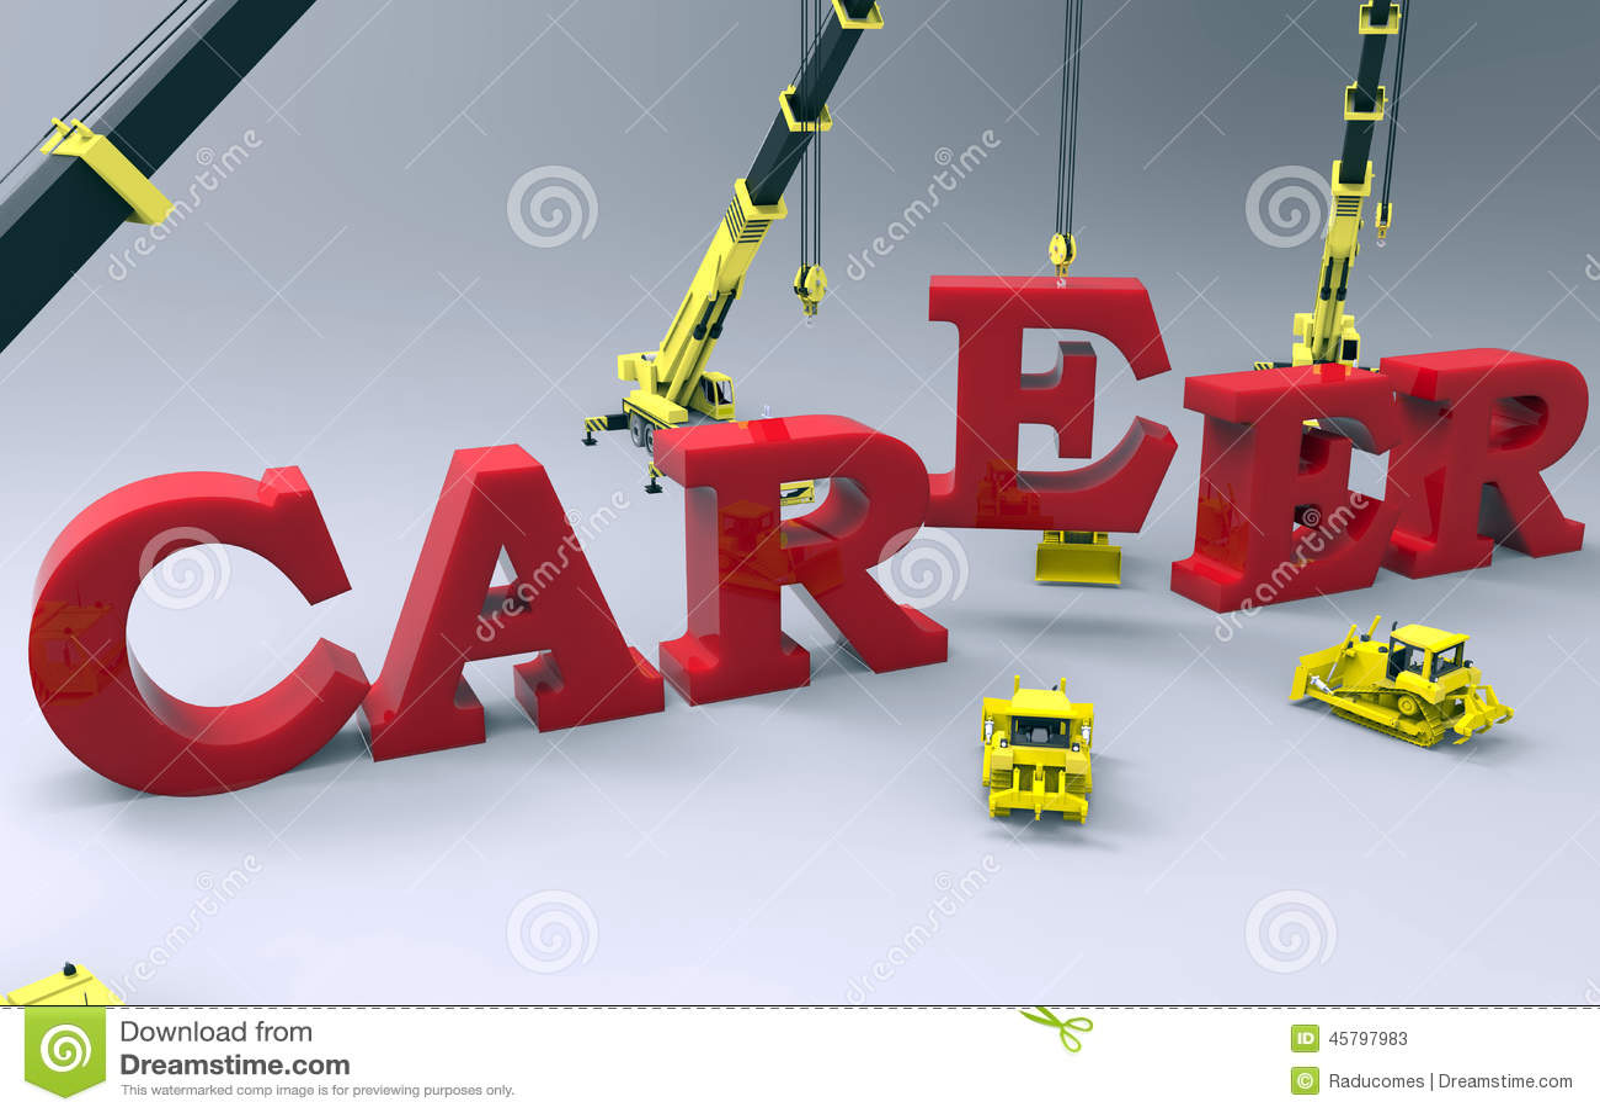 royalty free illustration download career building